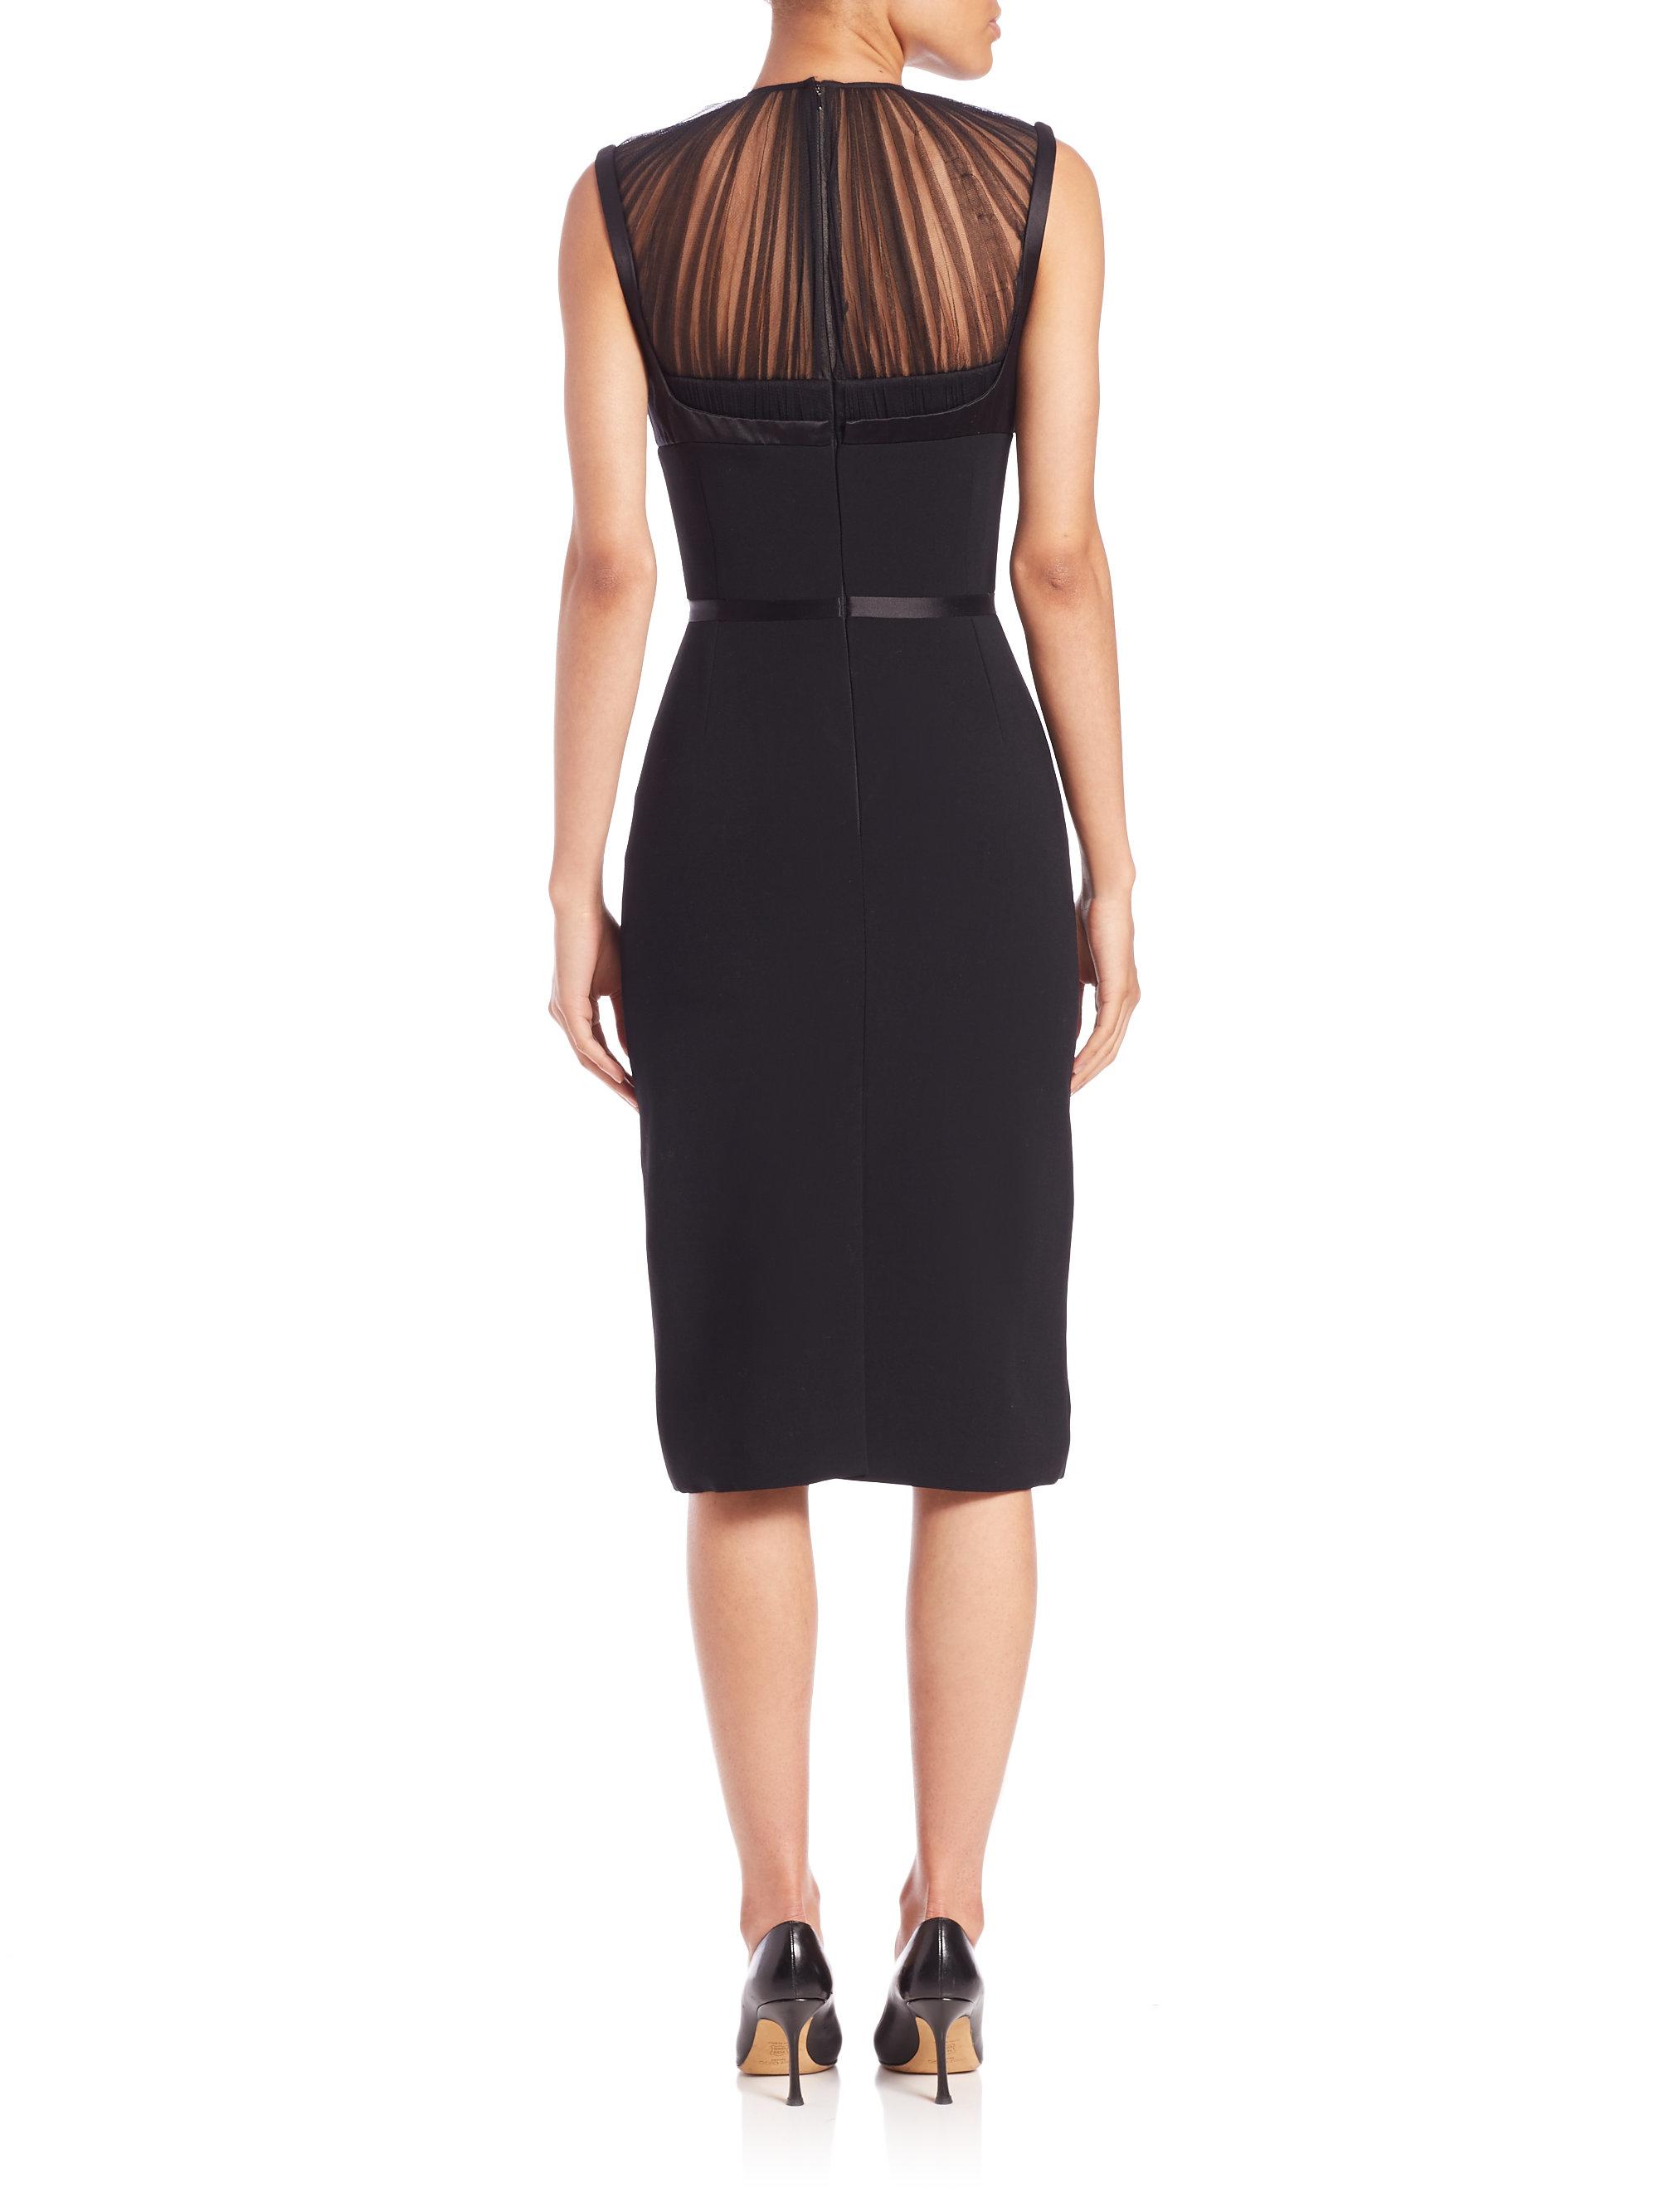 Alexander Mcqueen Sheer Top Sheath Dress In Black Lyst